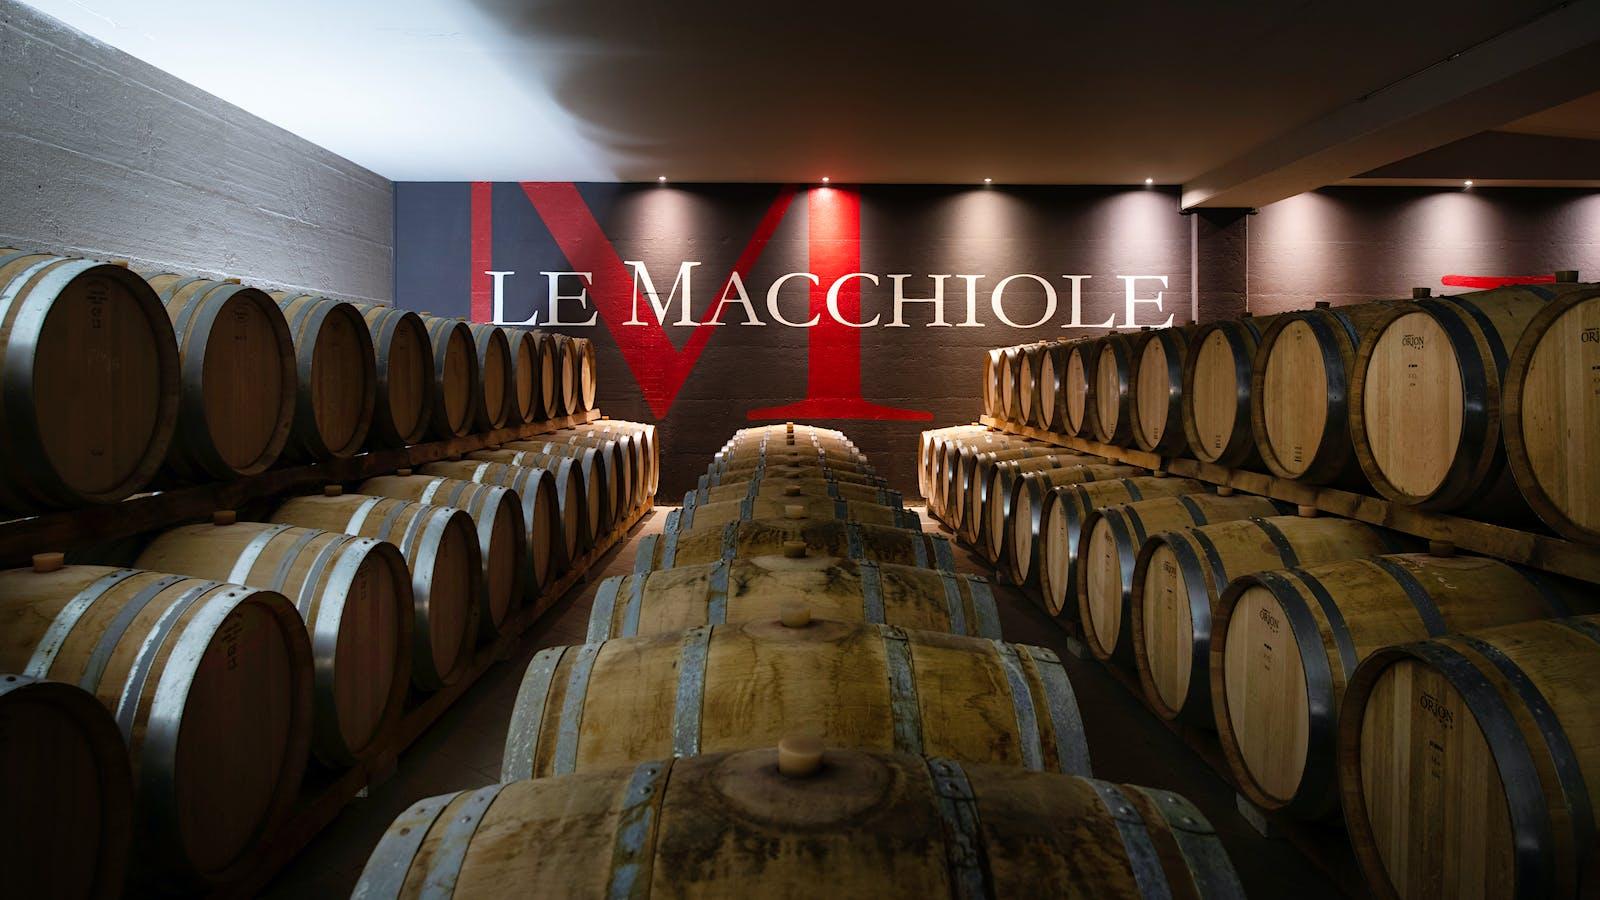 Le Macchiole's Flagship Messorio Reveals the Graceful Side of Merlot